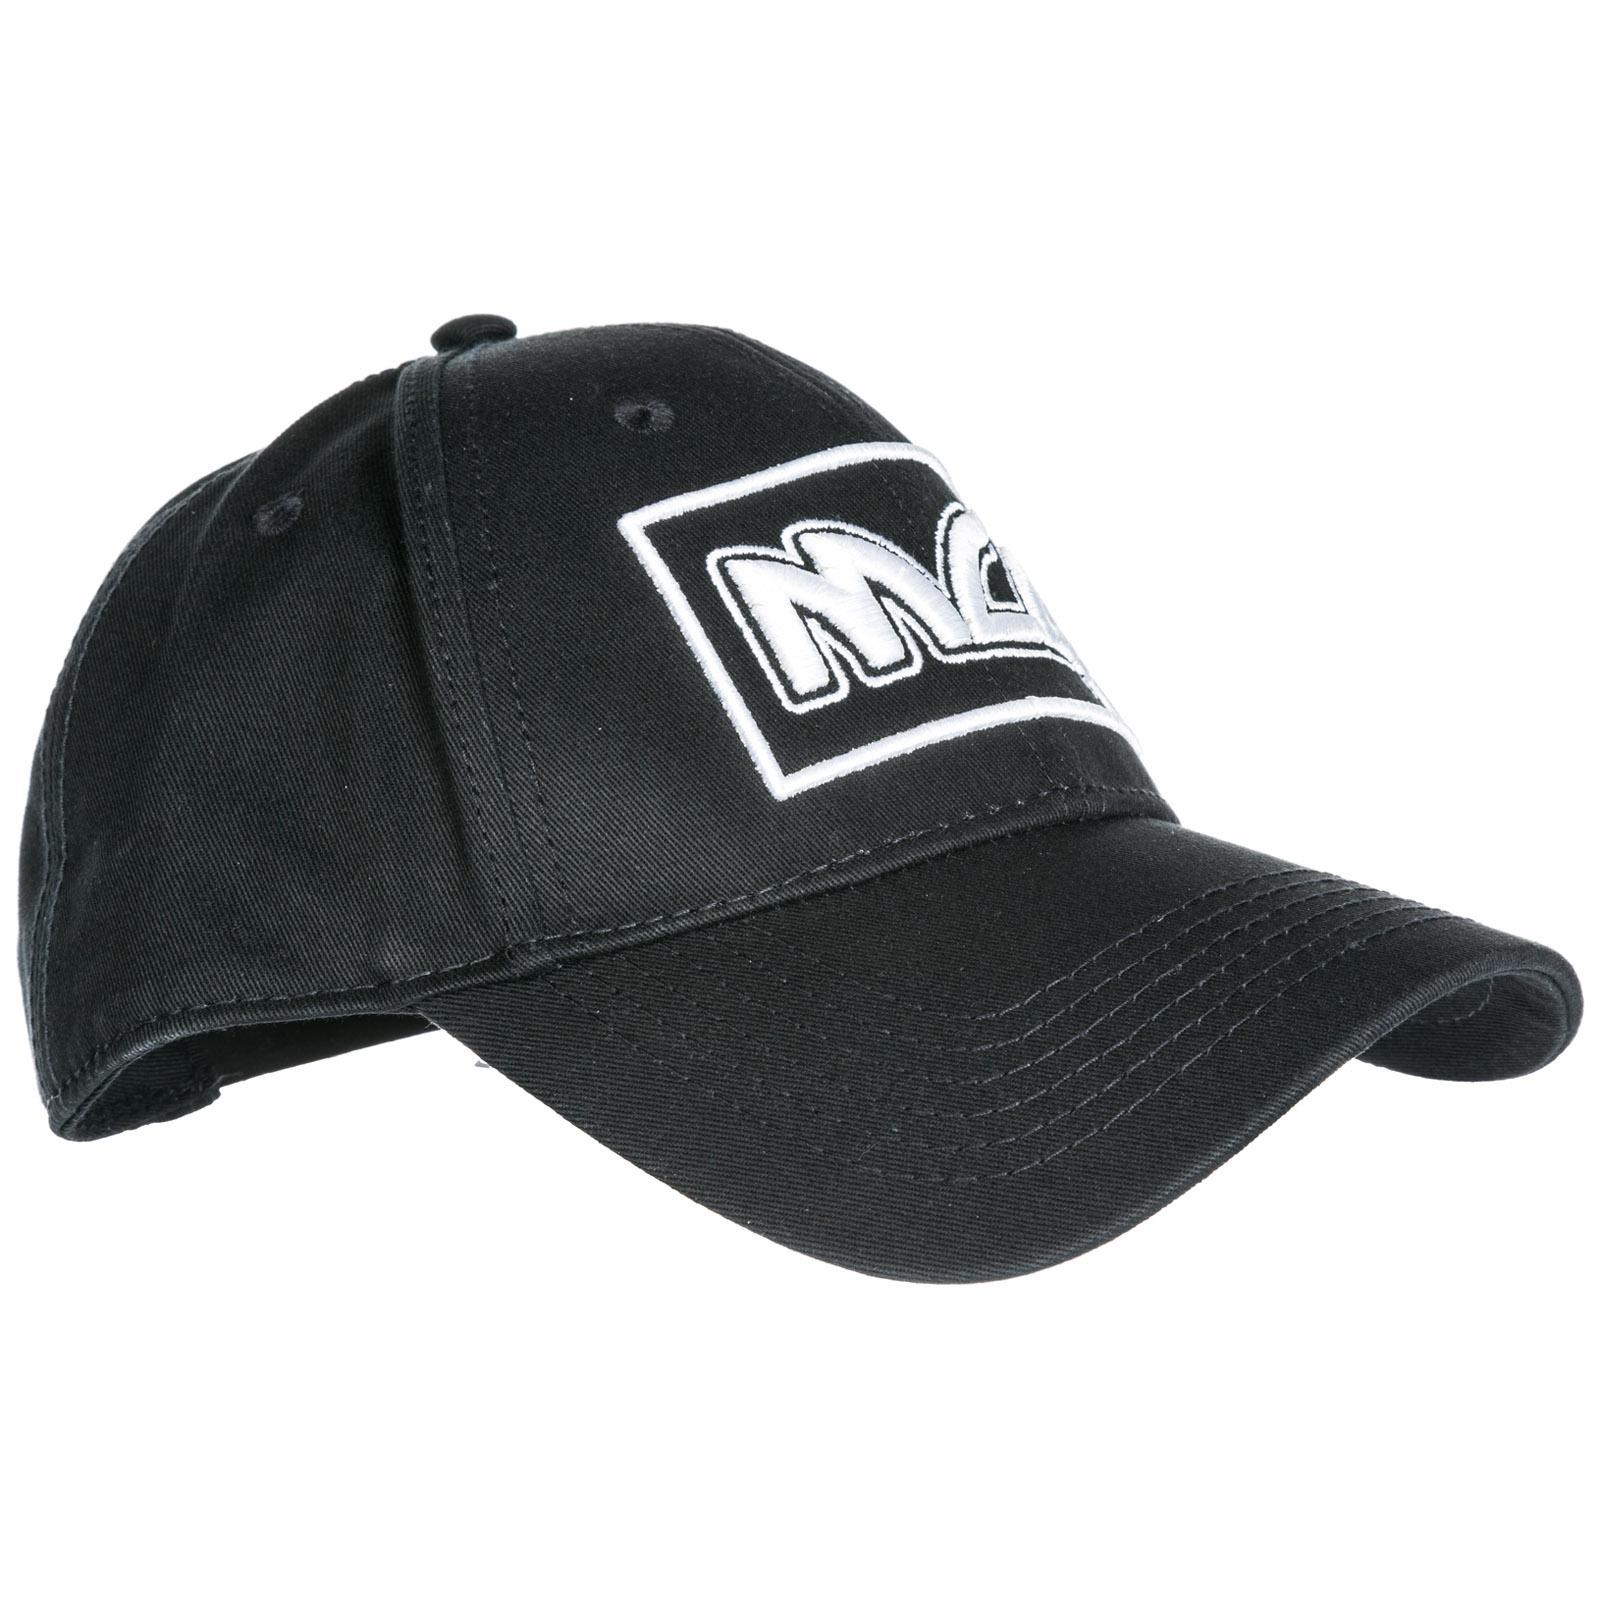 e0db5ccdd McQ Adjustable Men's Cotton Hat Baseball Cap Metal Logo in Black for ...